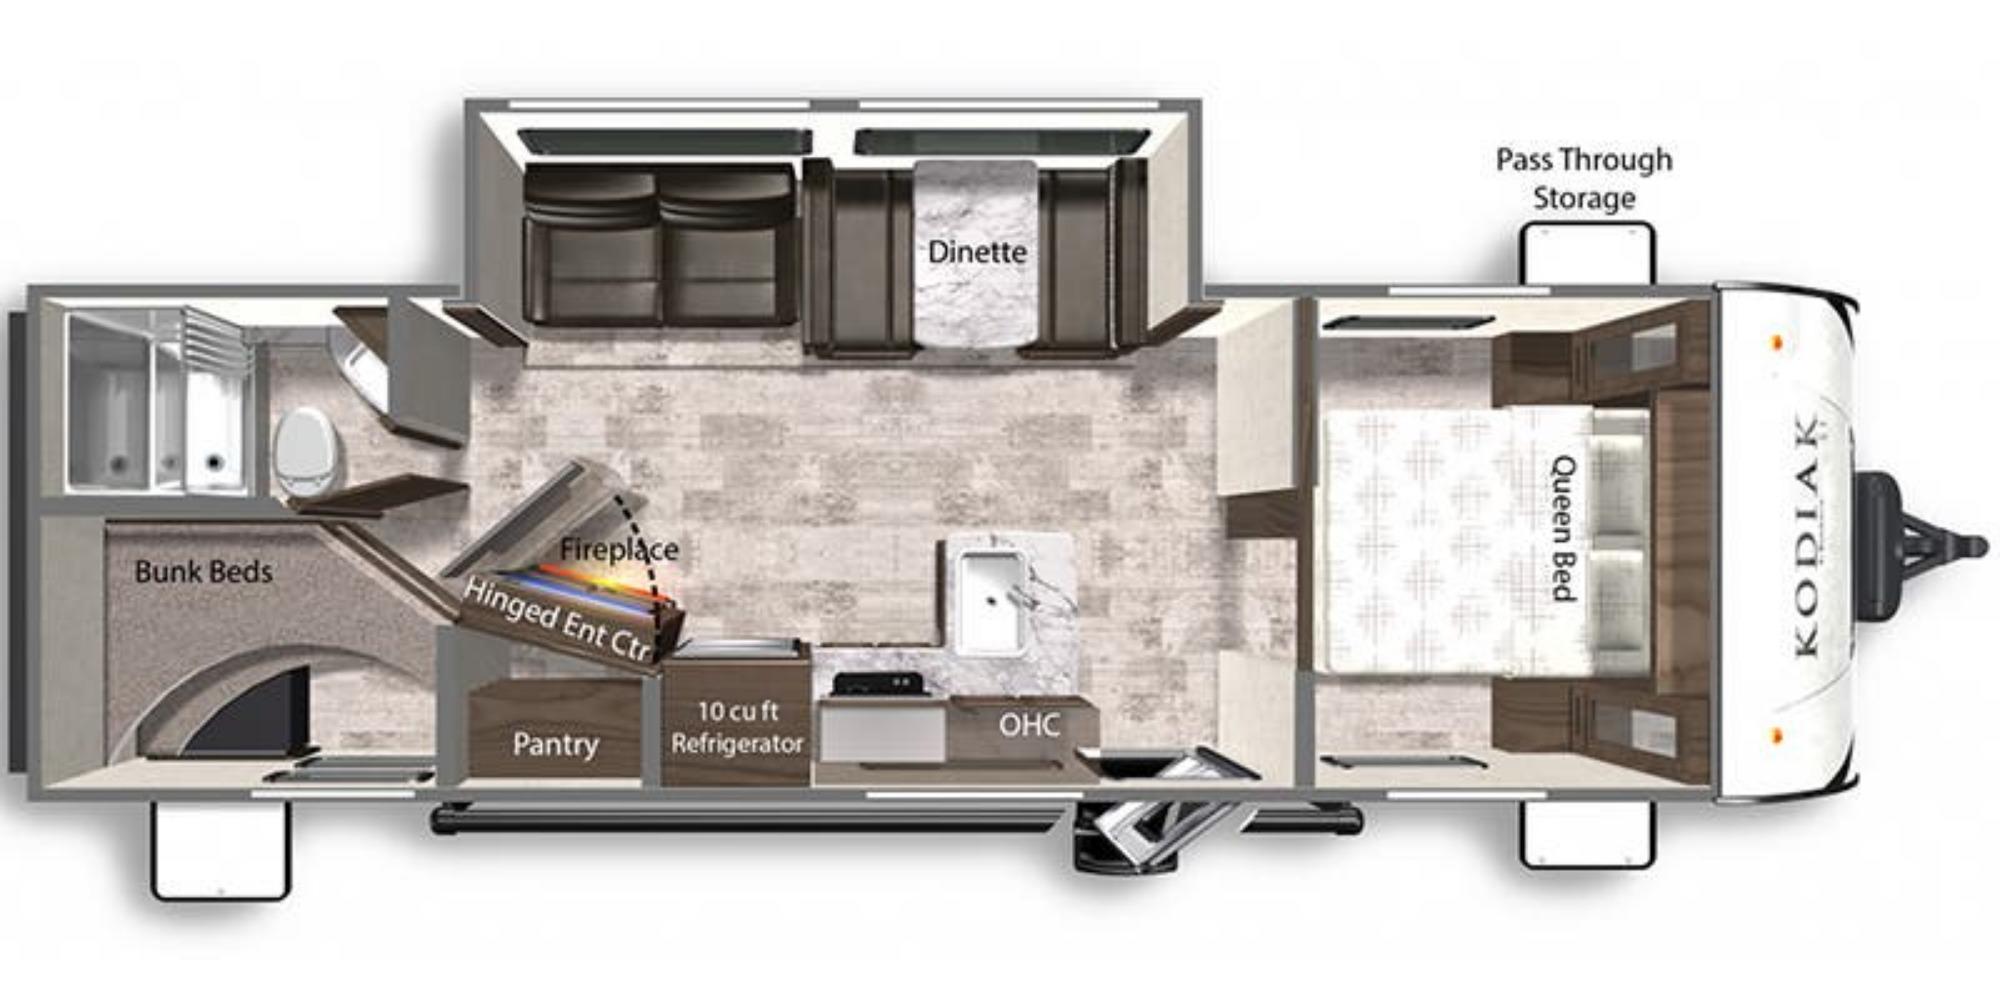 View Floor Plan for 2021 DUTCHMEN KODIAK 27SBH